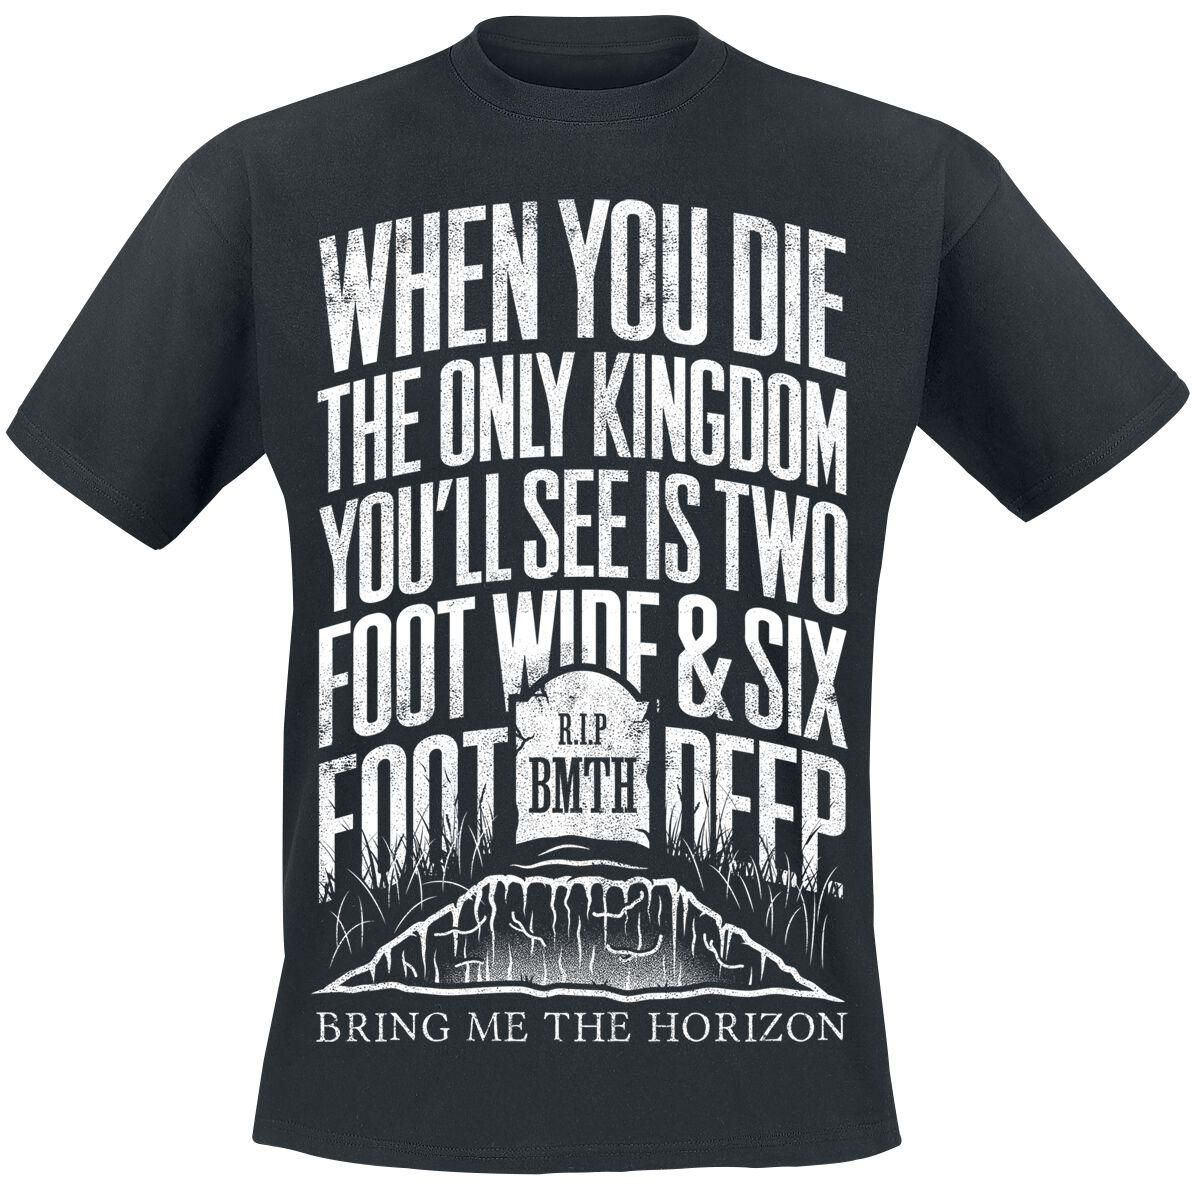 5ede938cd Bring Me The Horizon. Grave. T-Shirt. 4 Reviews